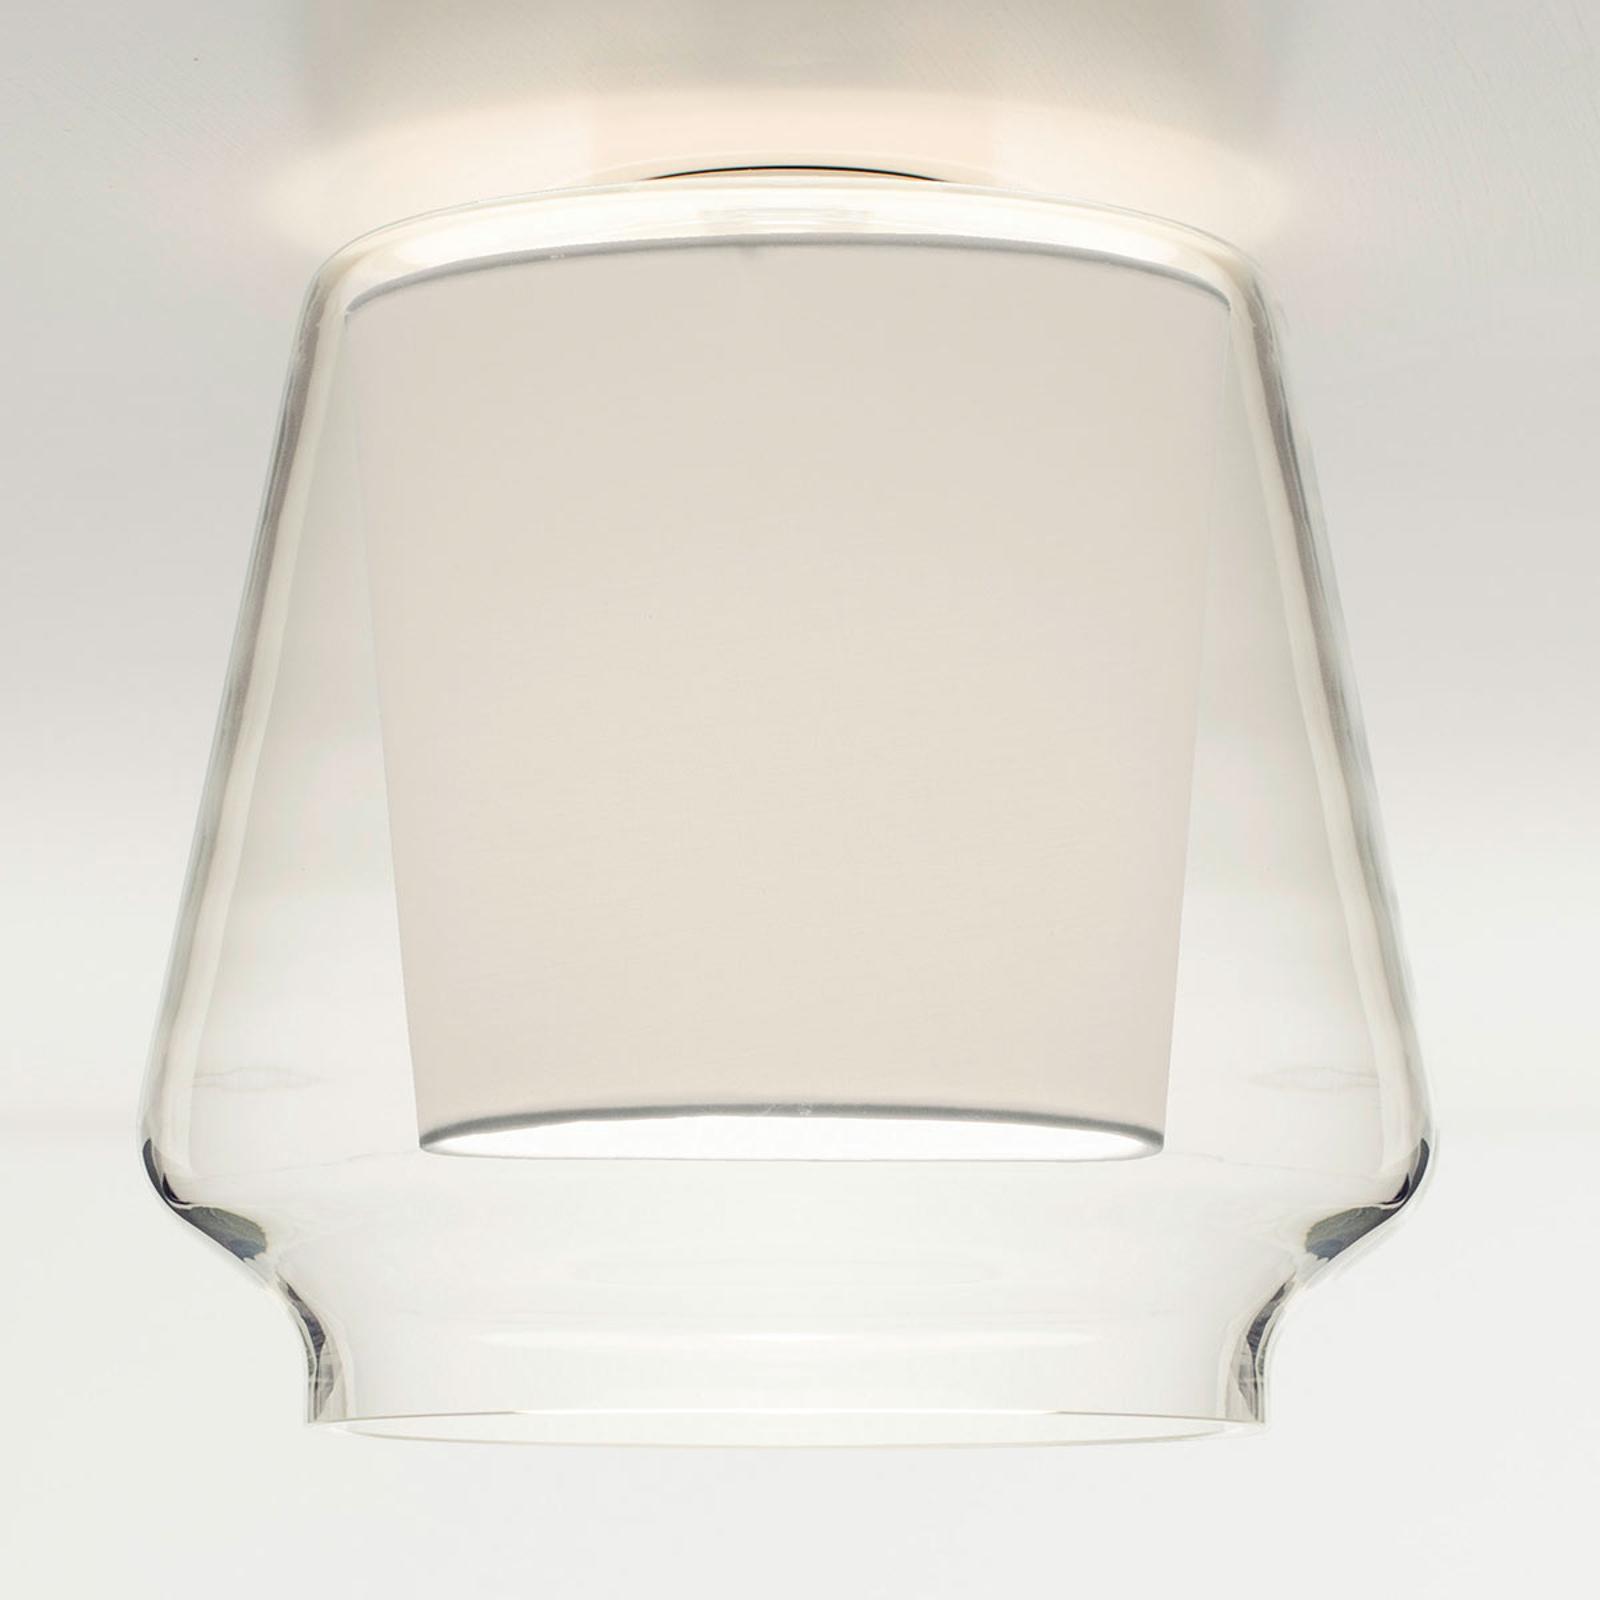 Casablanca Aleve lampa sufitowa, biała